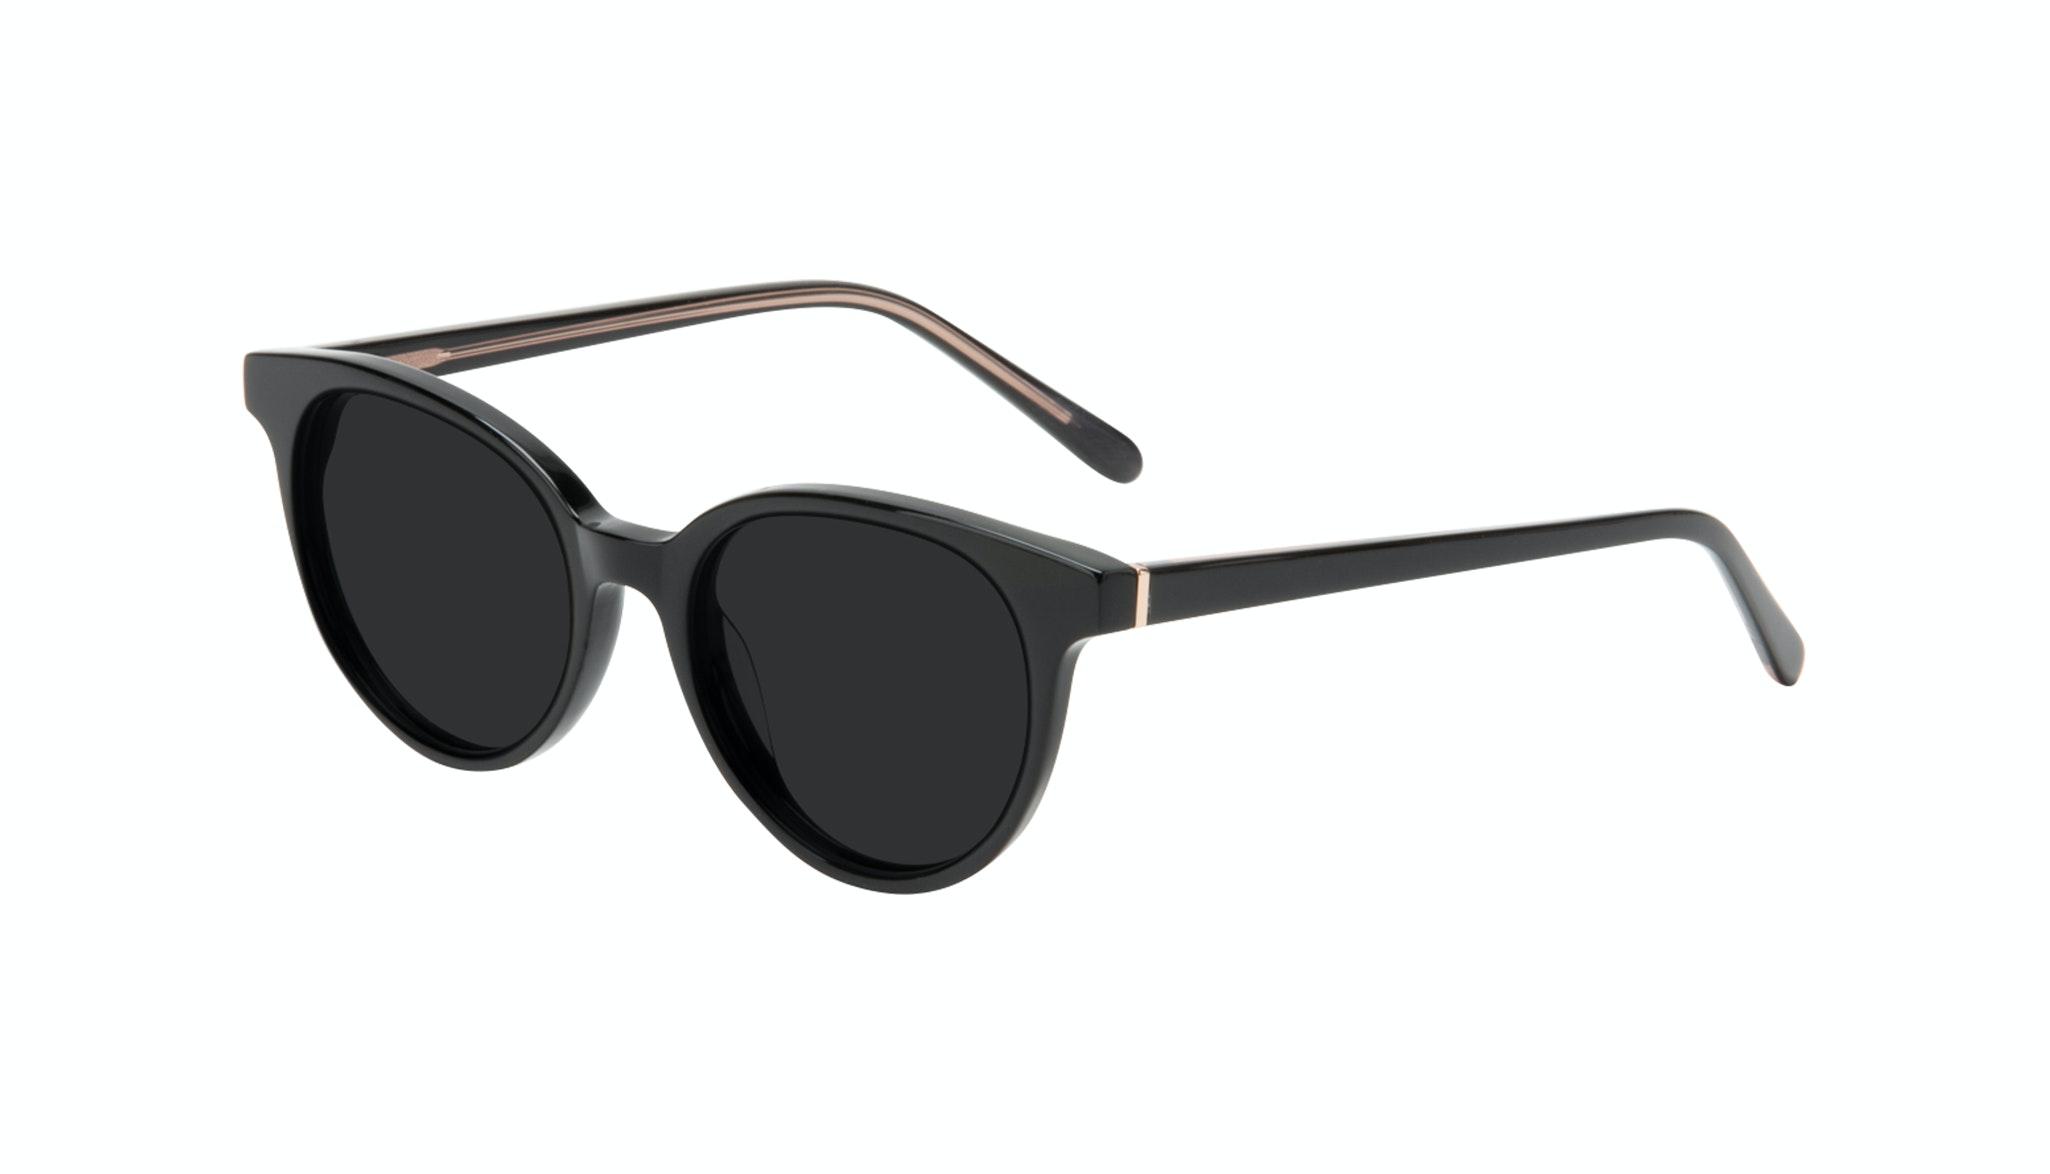 Affordable Fashion Glasses Round Sunglasses Women Bright Black Tilt